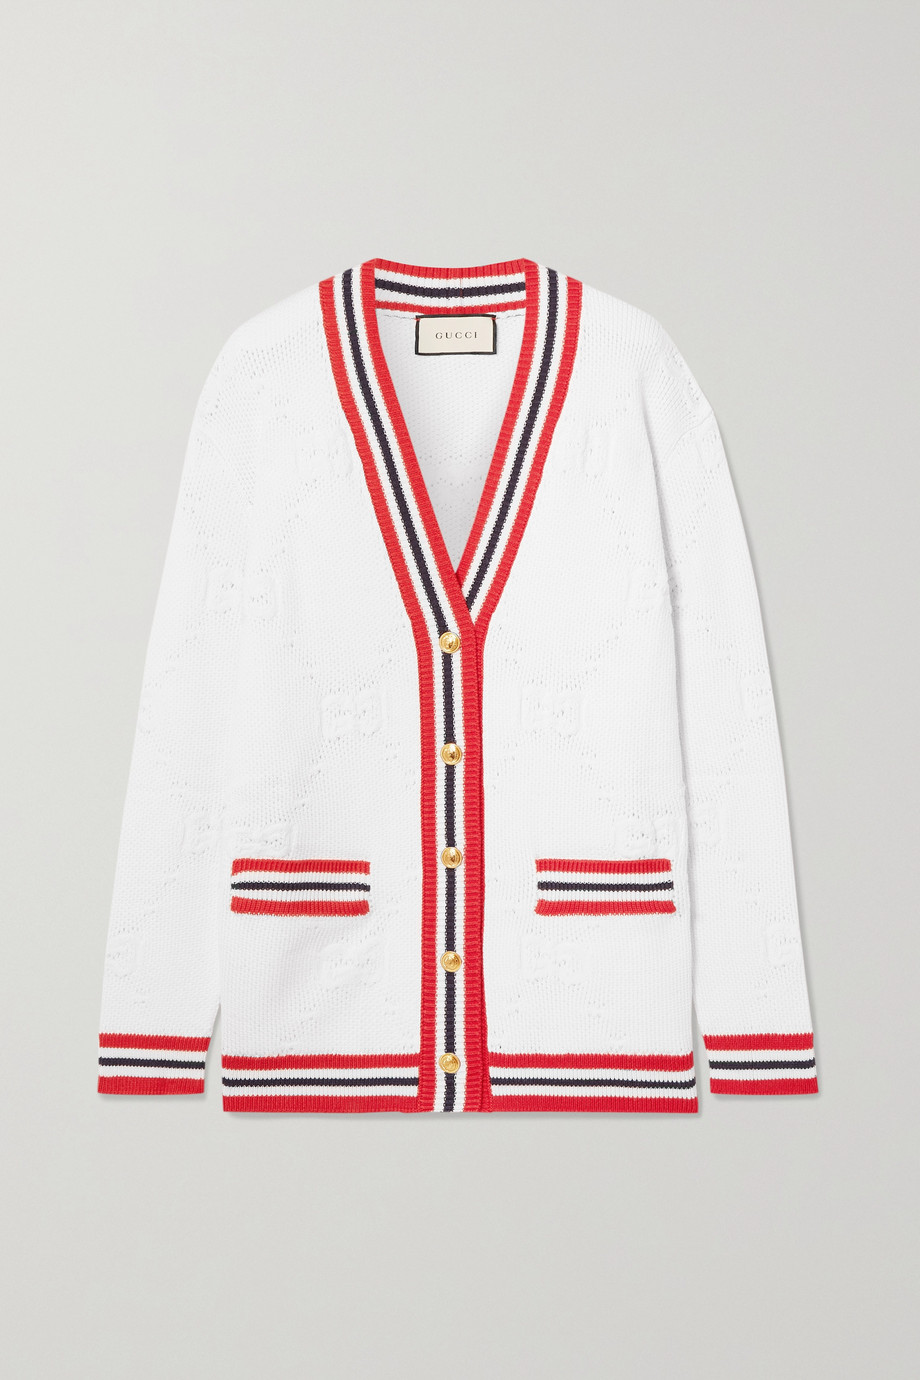 Gucci 条纹羊毛混纺提花针织开襟衫